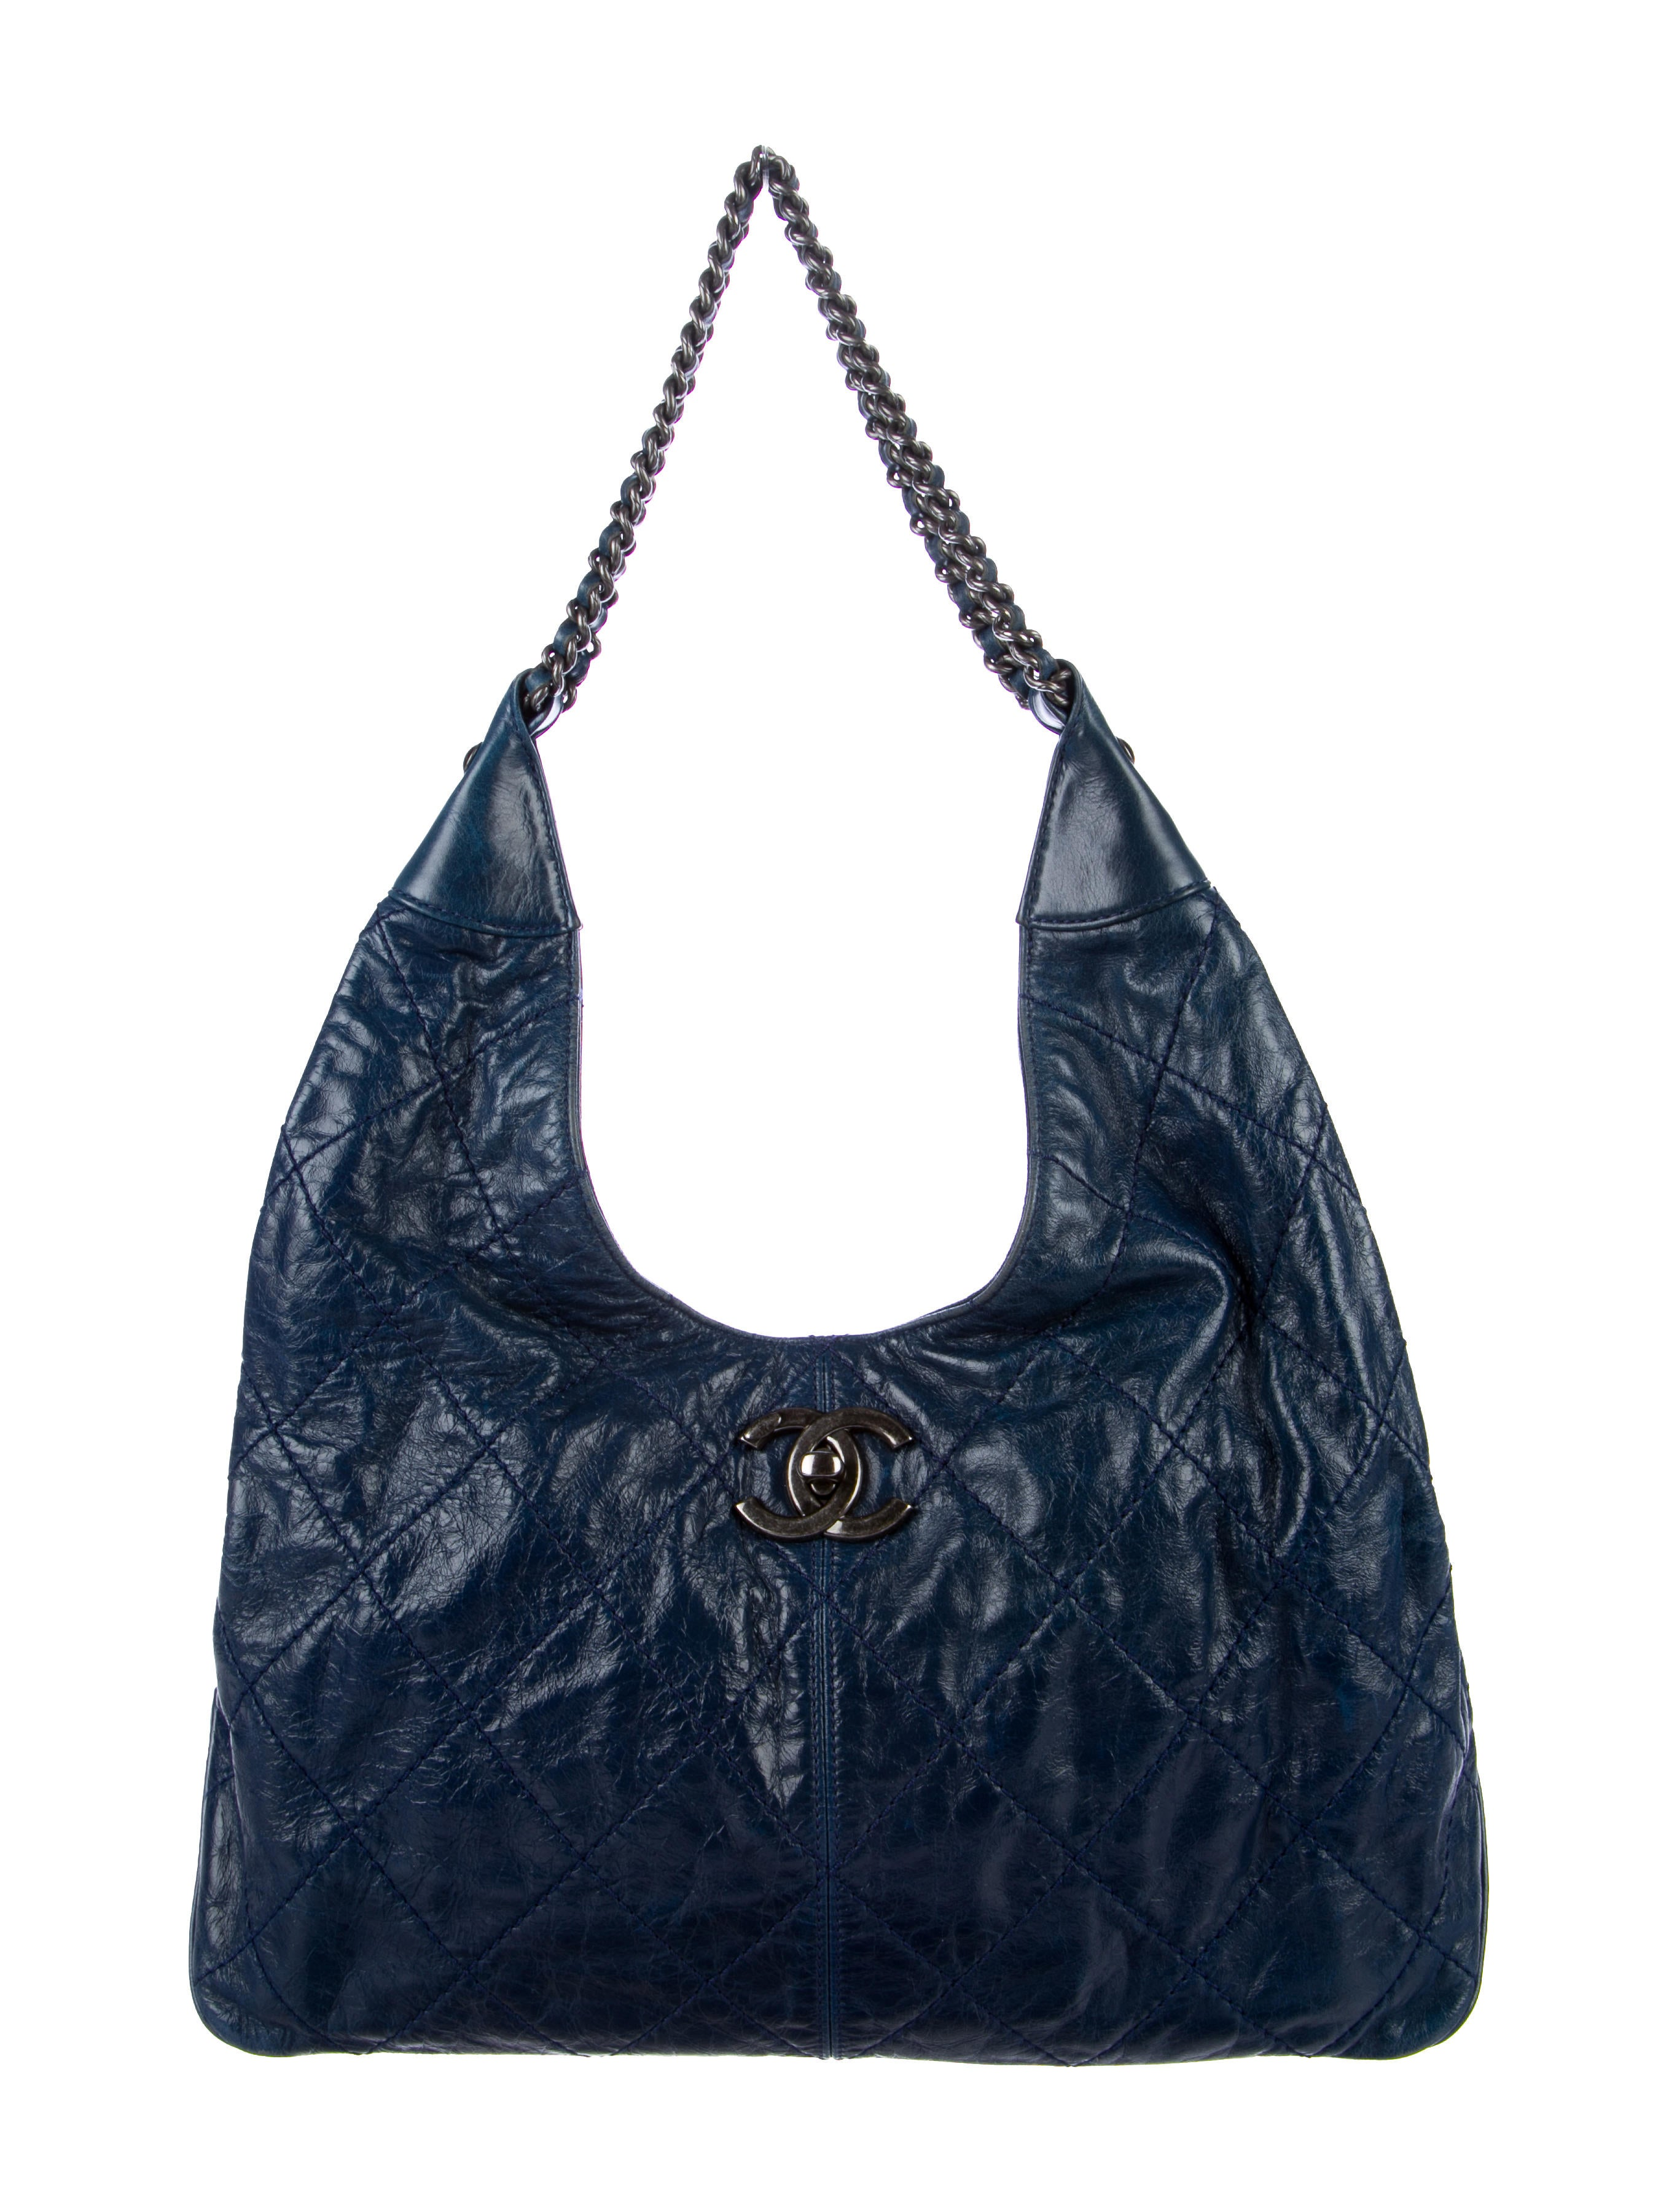 793d91f8c1f2 Prada 2017 Trompe L'Oeil Cahier Velvet Bag - Handbags - PRA224621 ...